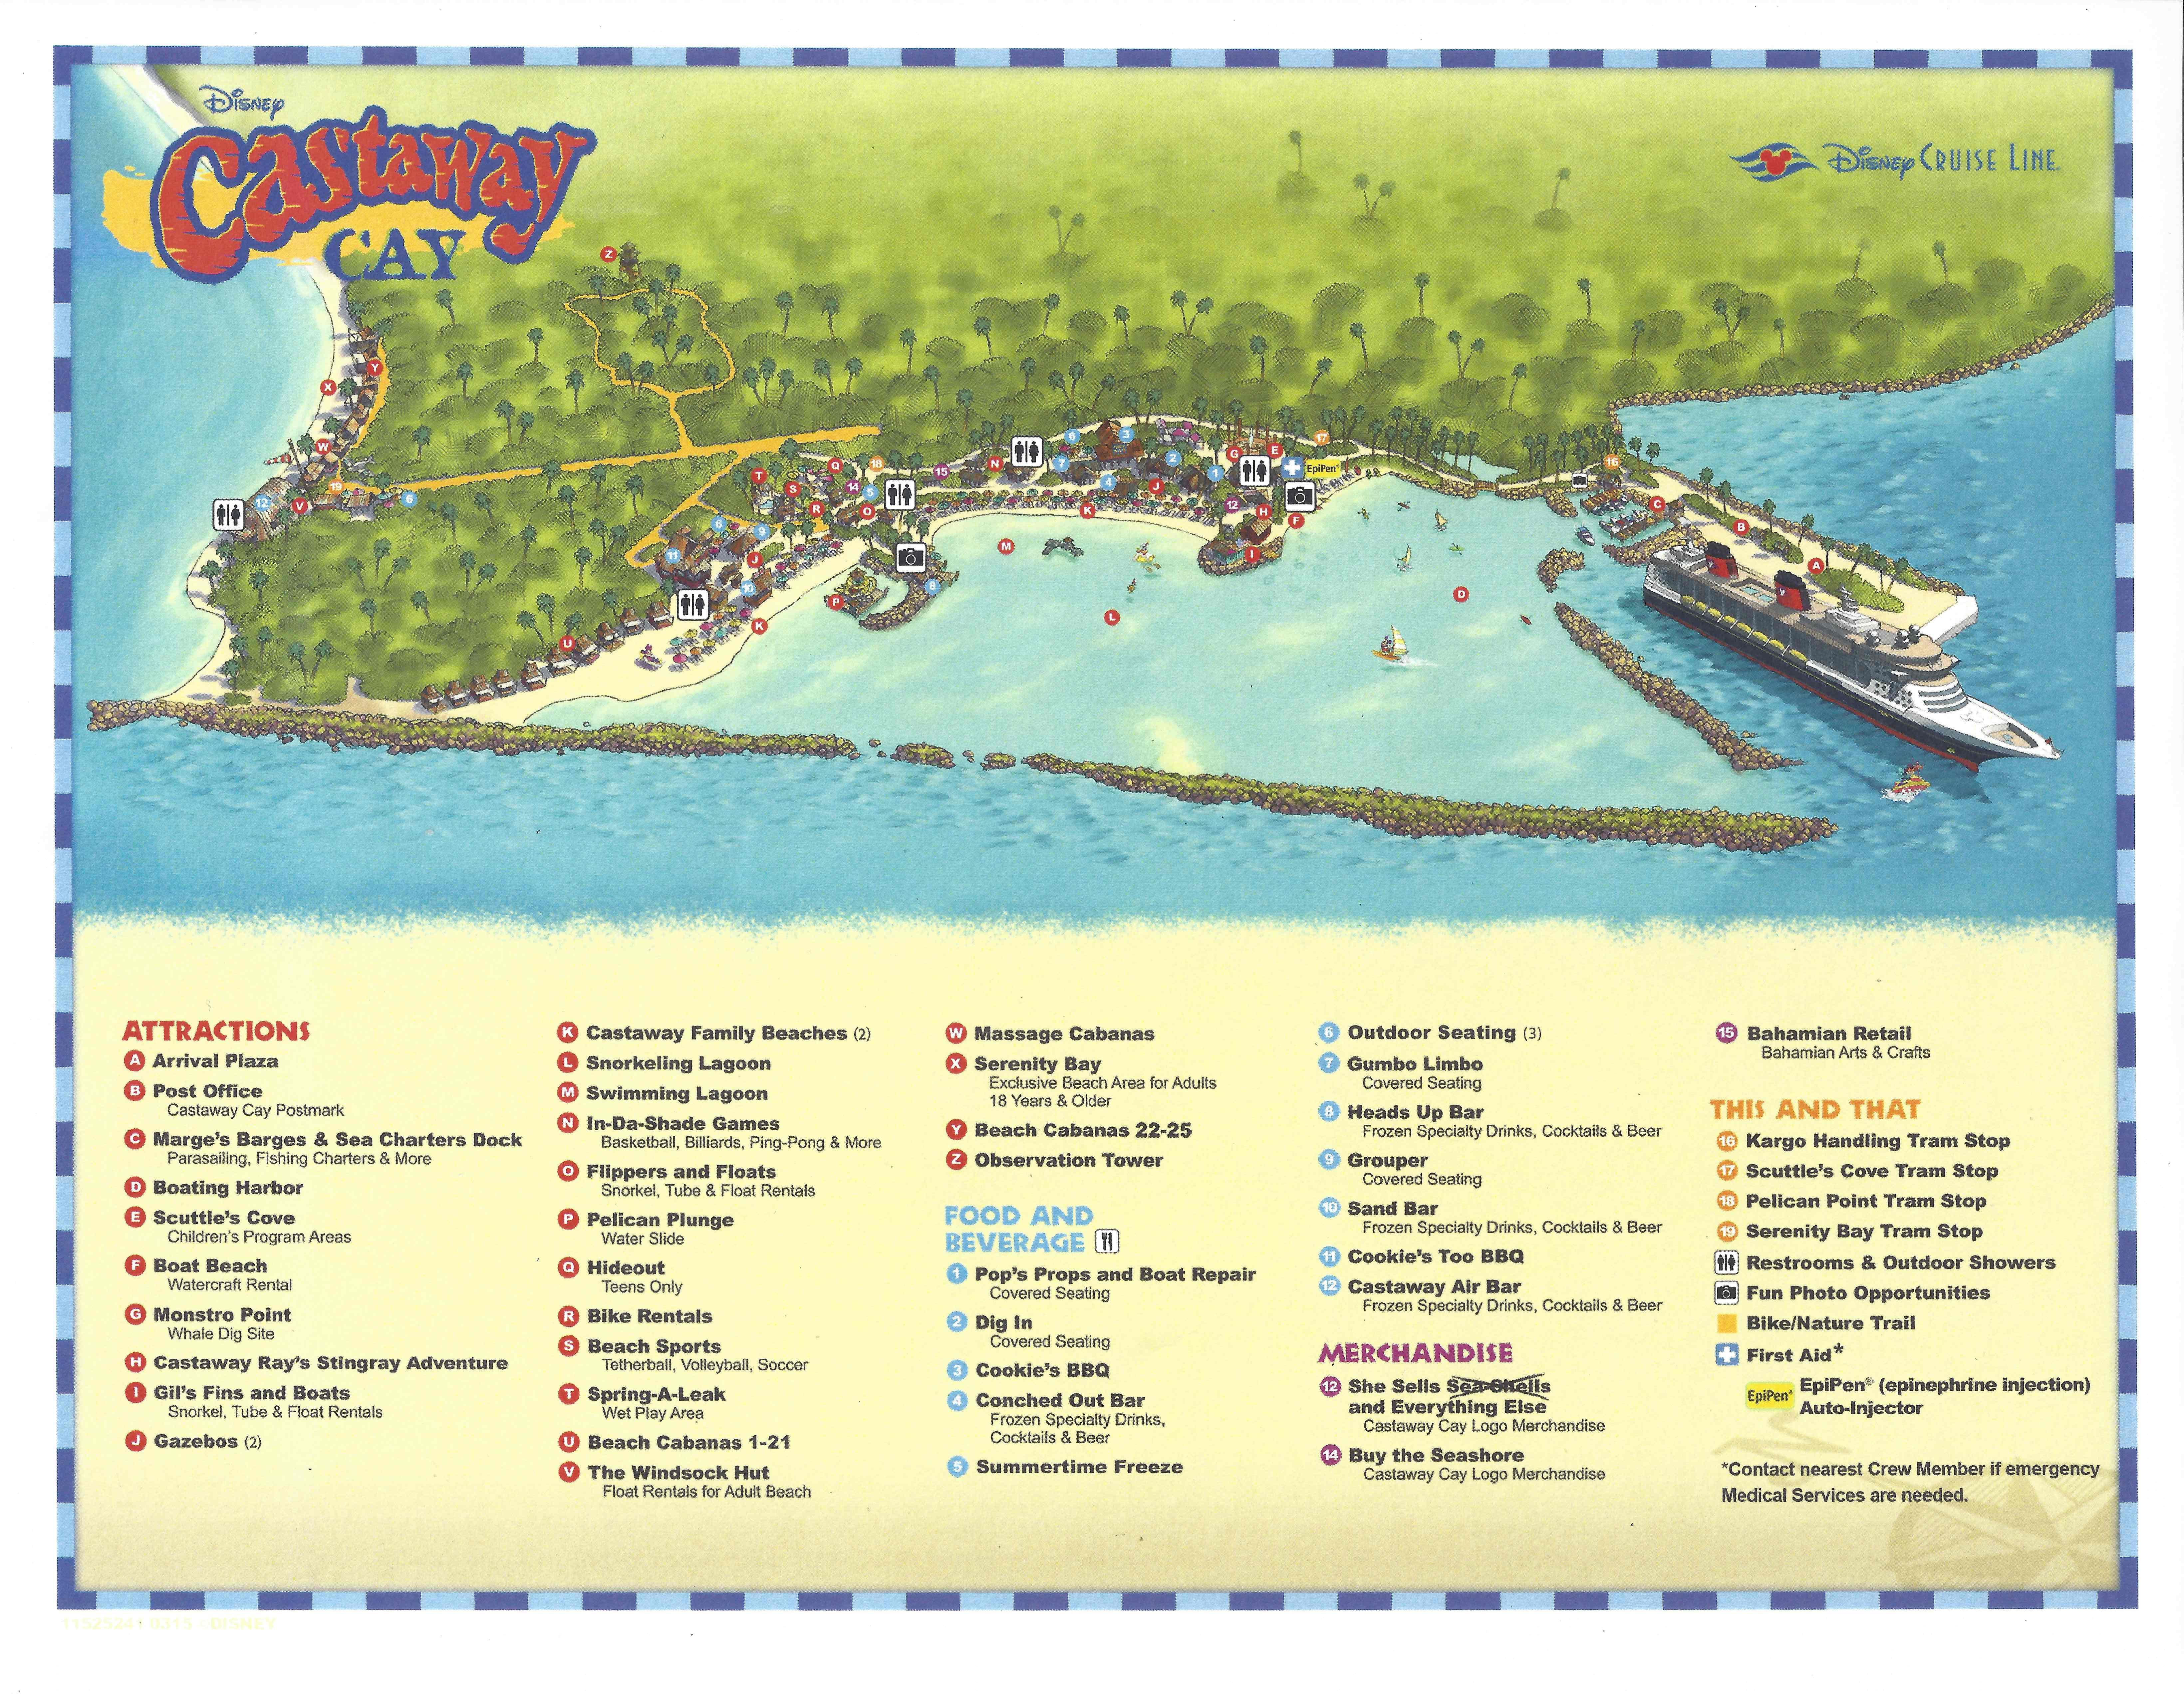 Map of Castaway Cay